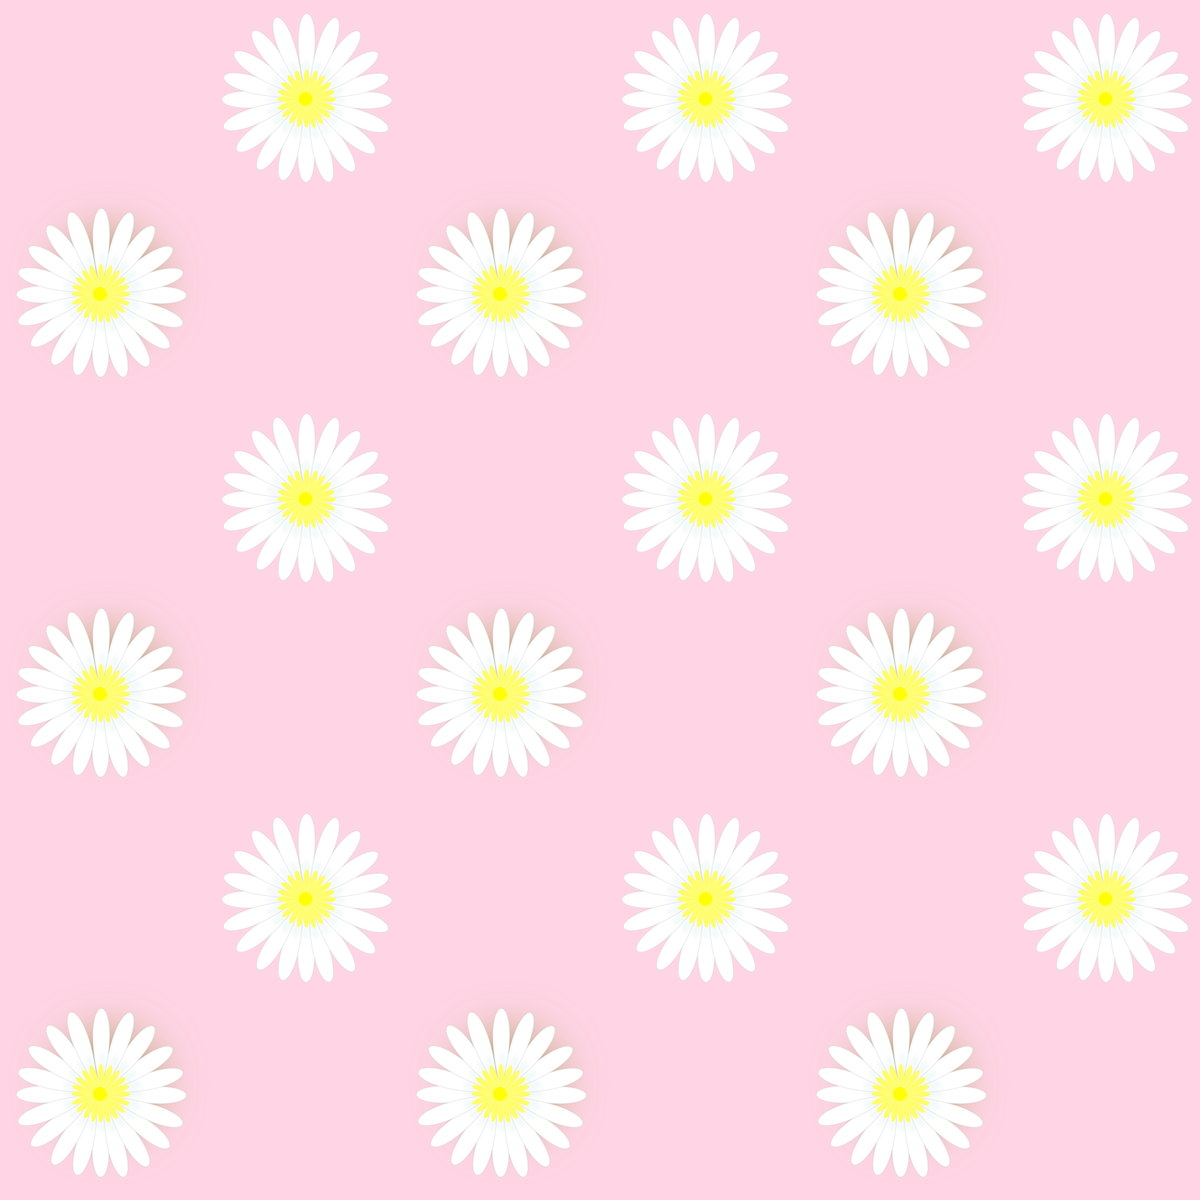 Free Digital Daisy Flower Scrapbooking Papers